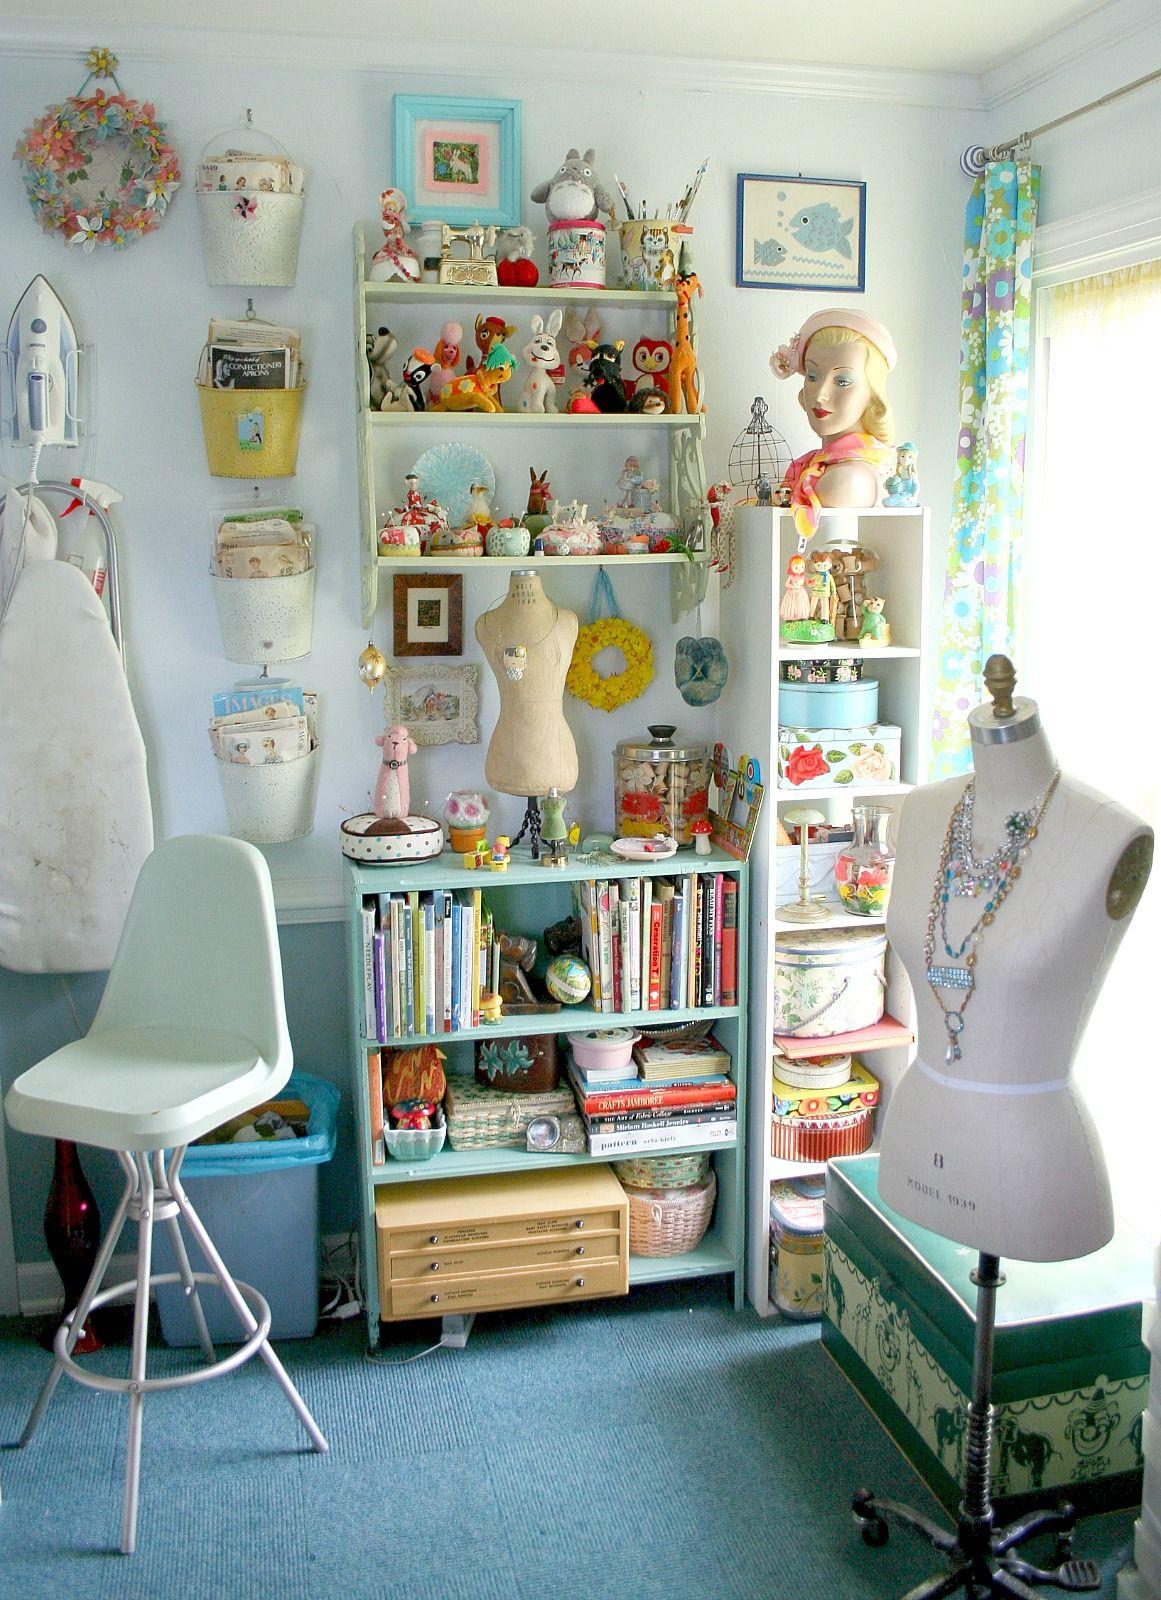 www.georgiapeachez.com | GeorgiaPeachez Sewing Studio Craft Room ...